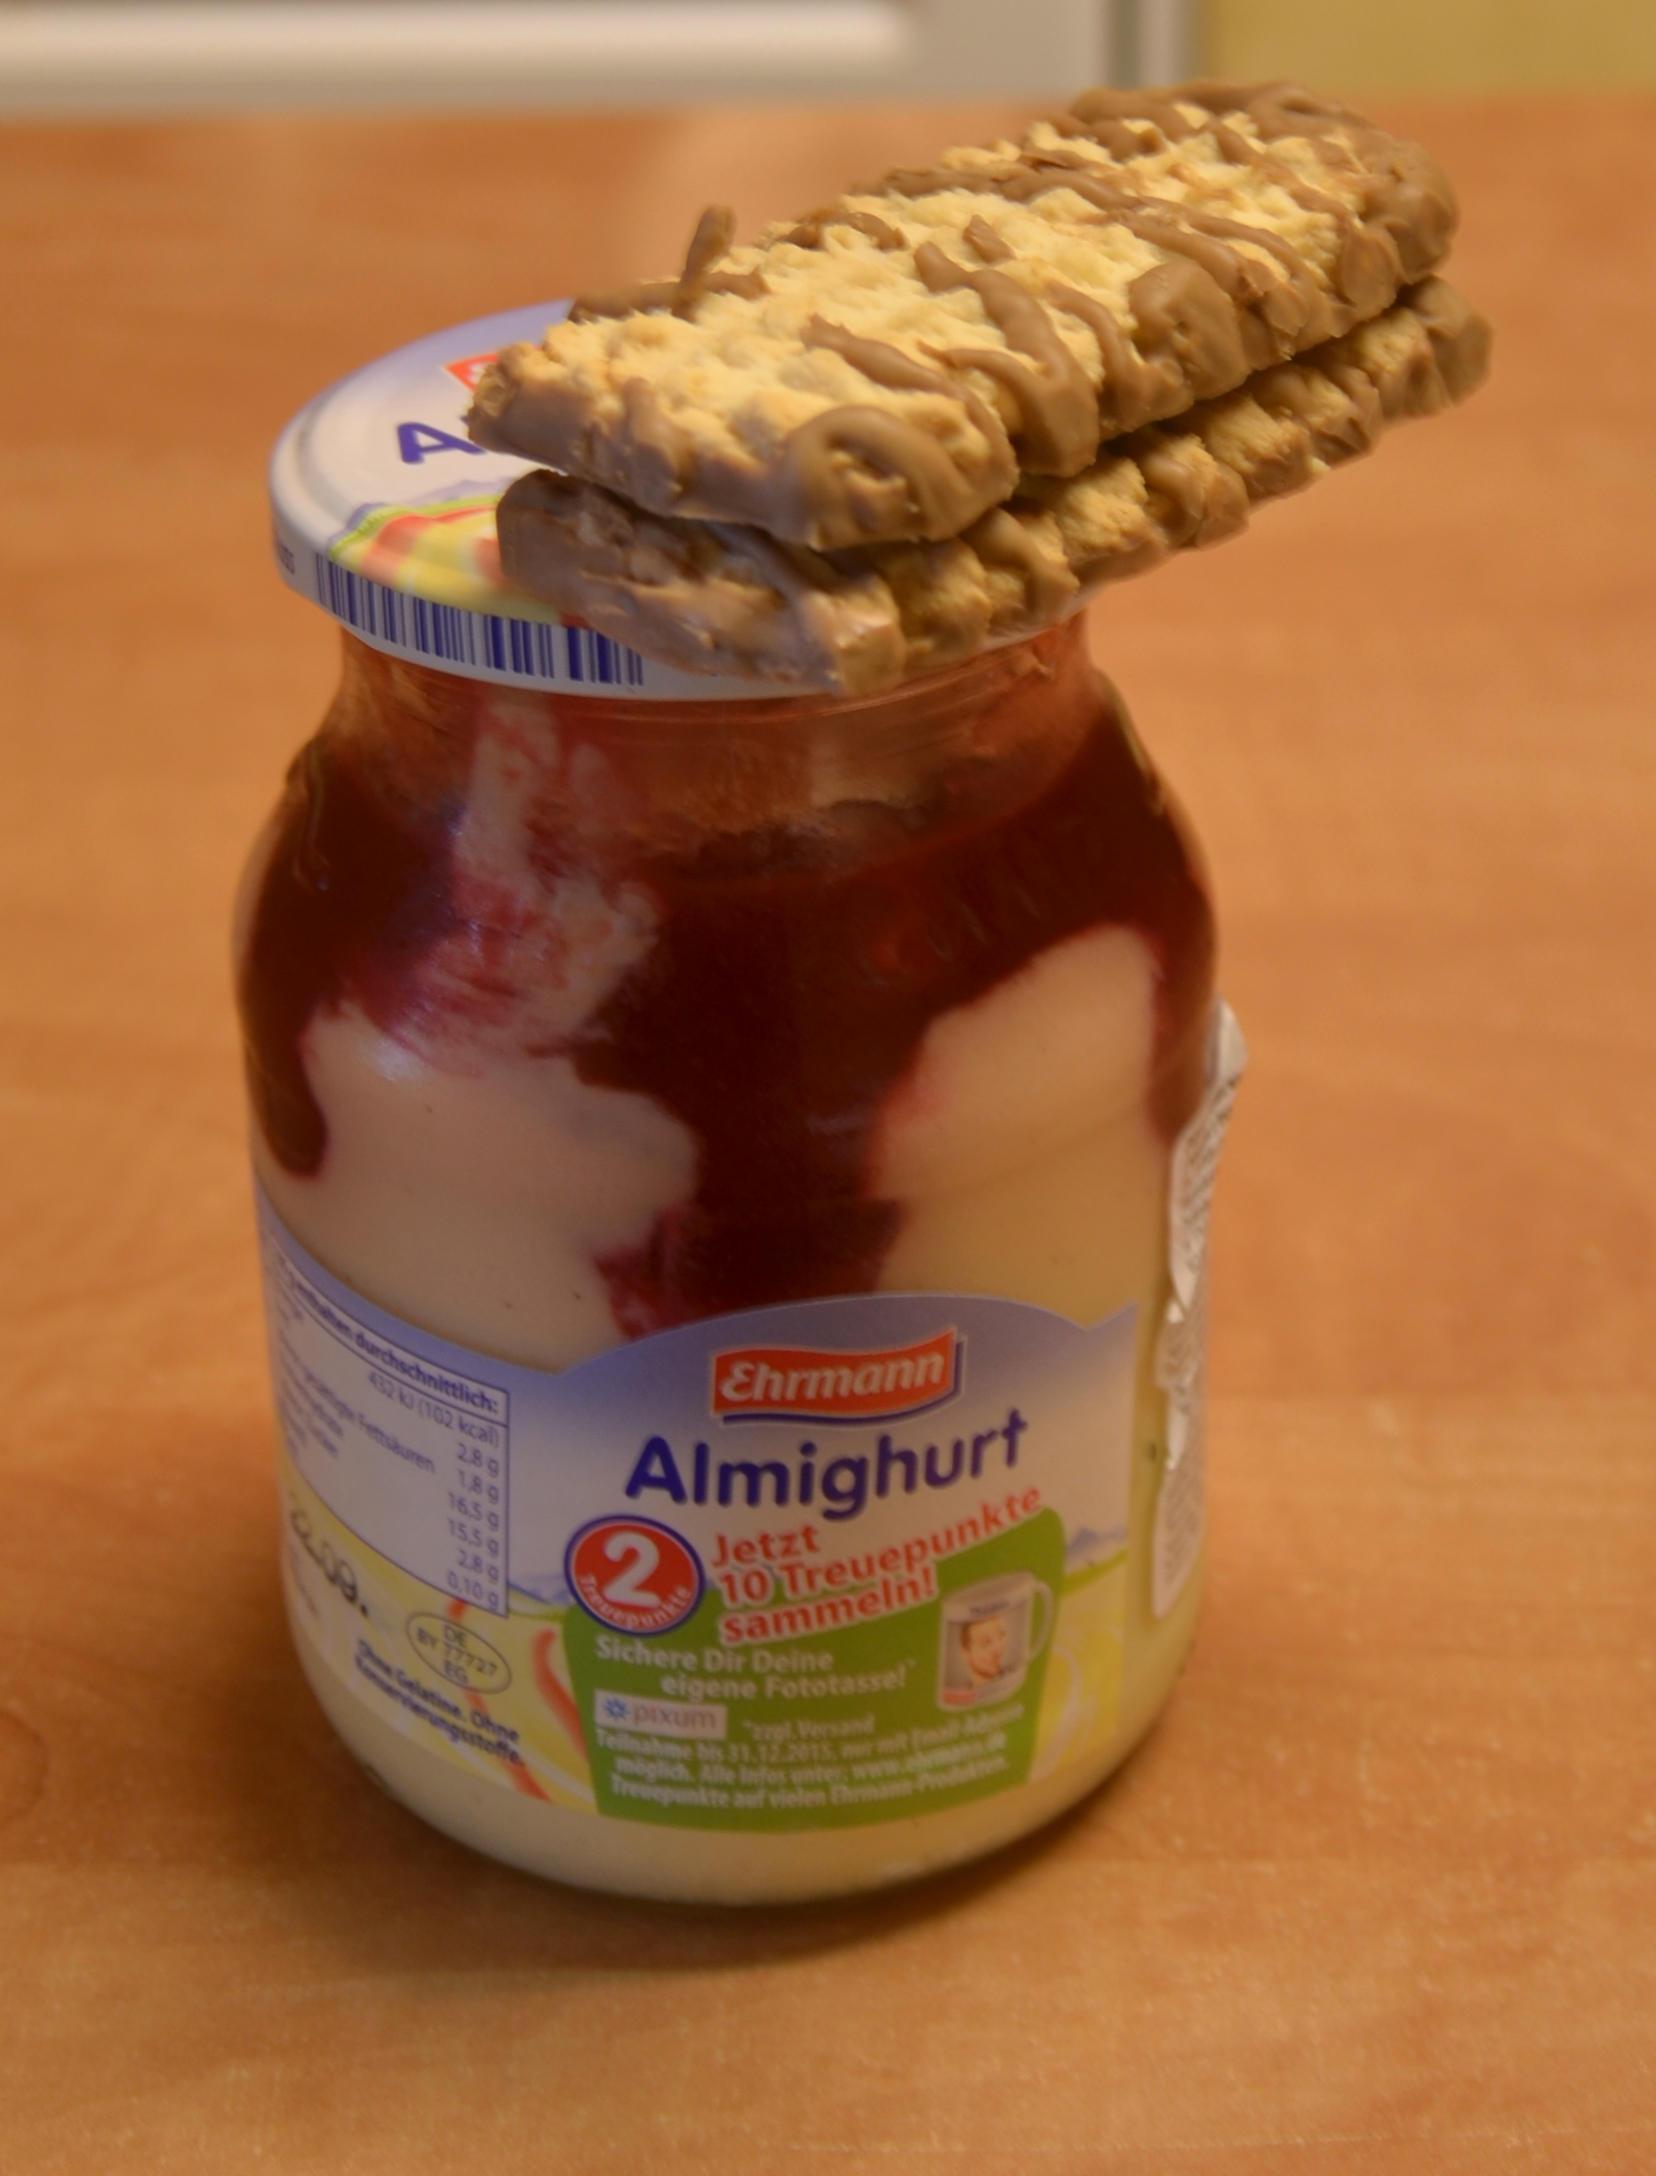 jogurt i ciastko